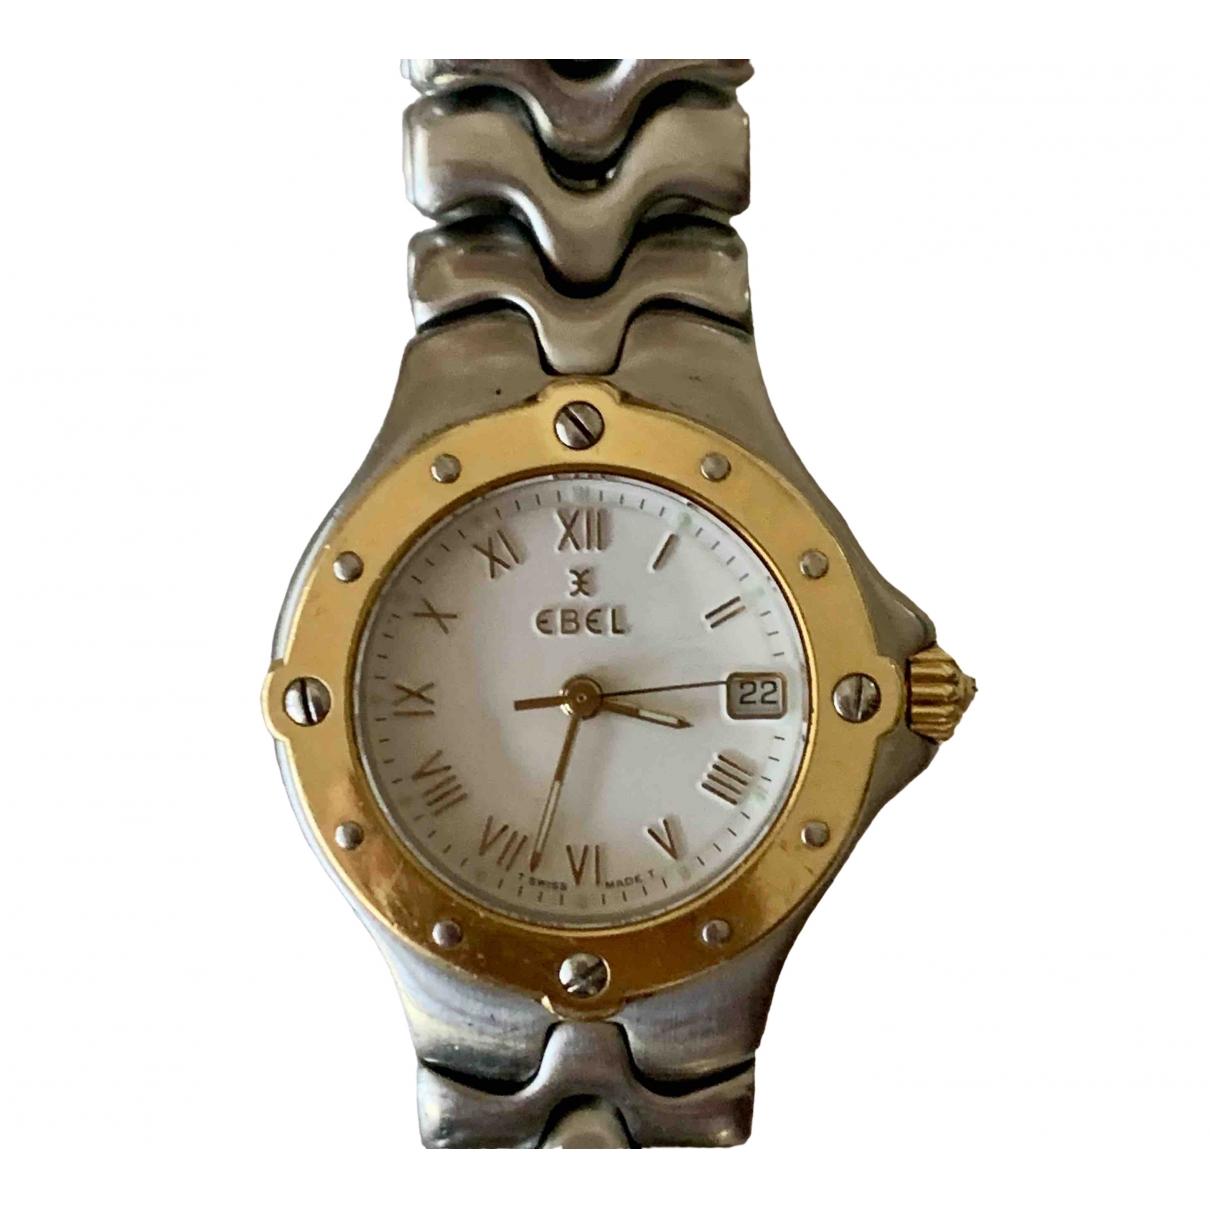 Reloj Sportwave Ebel